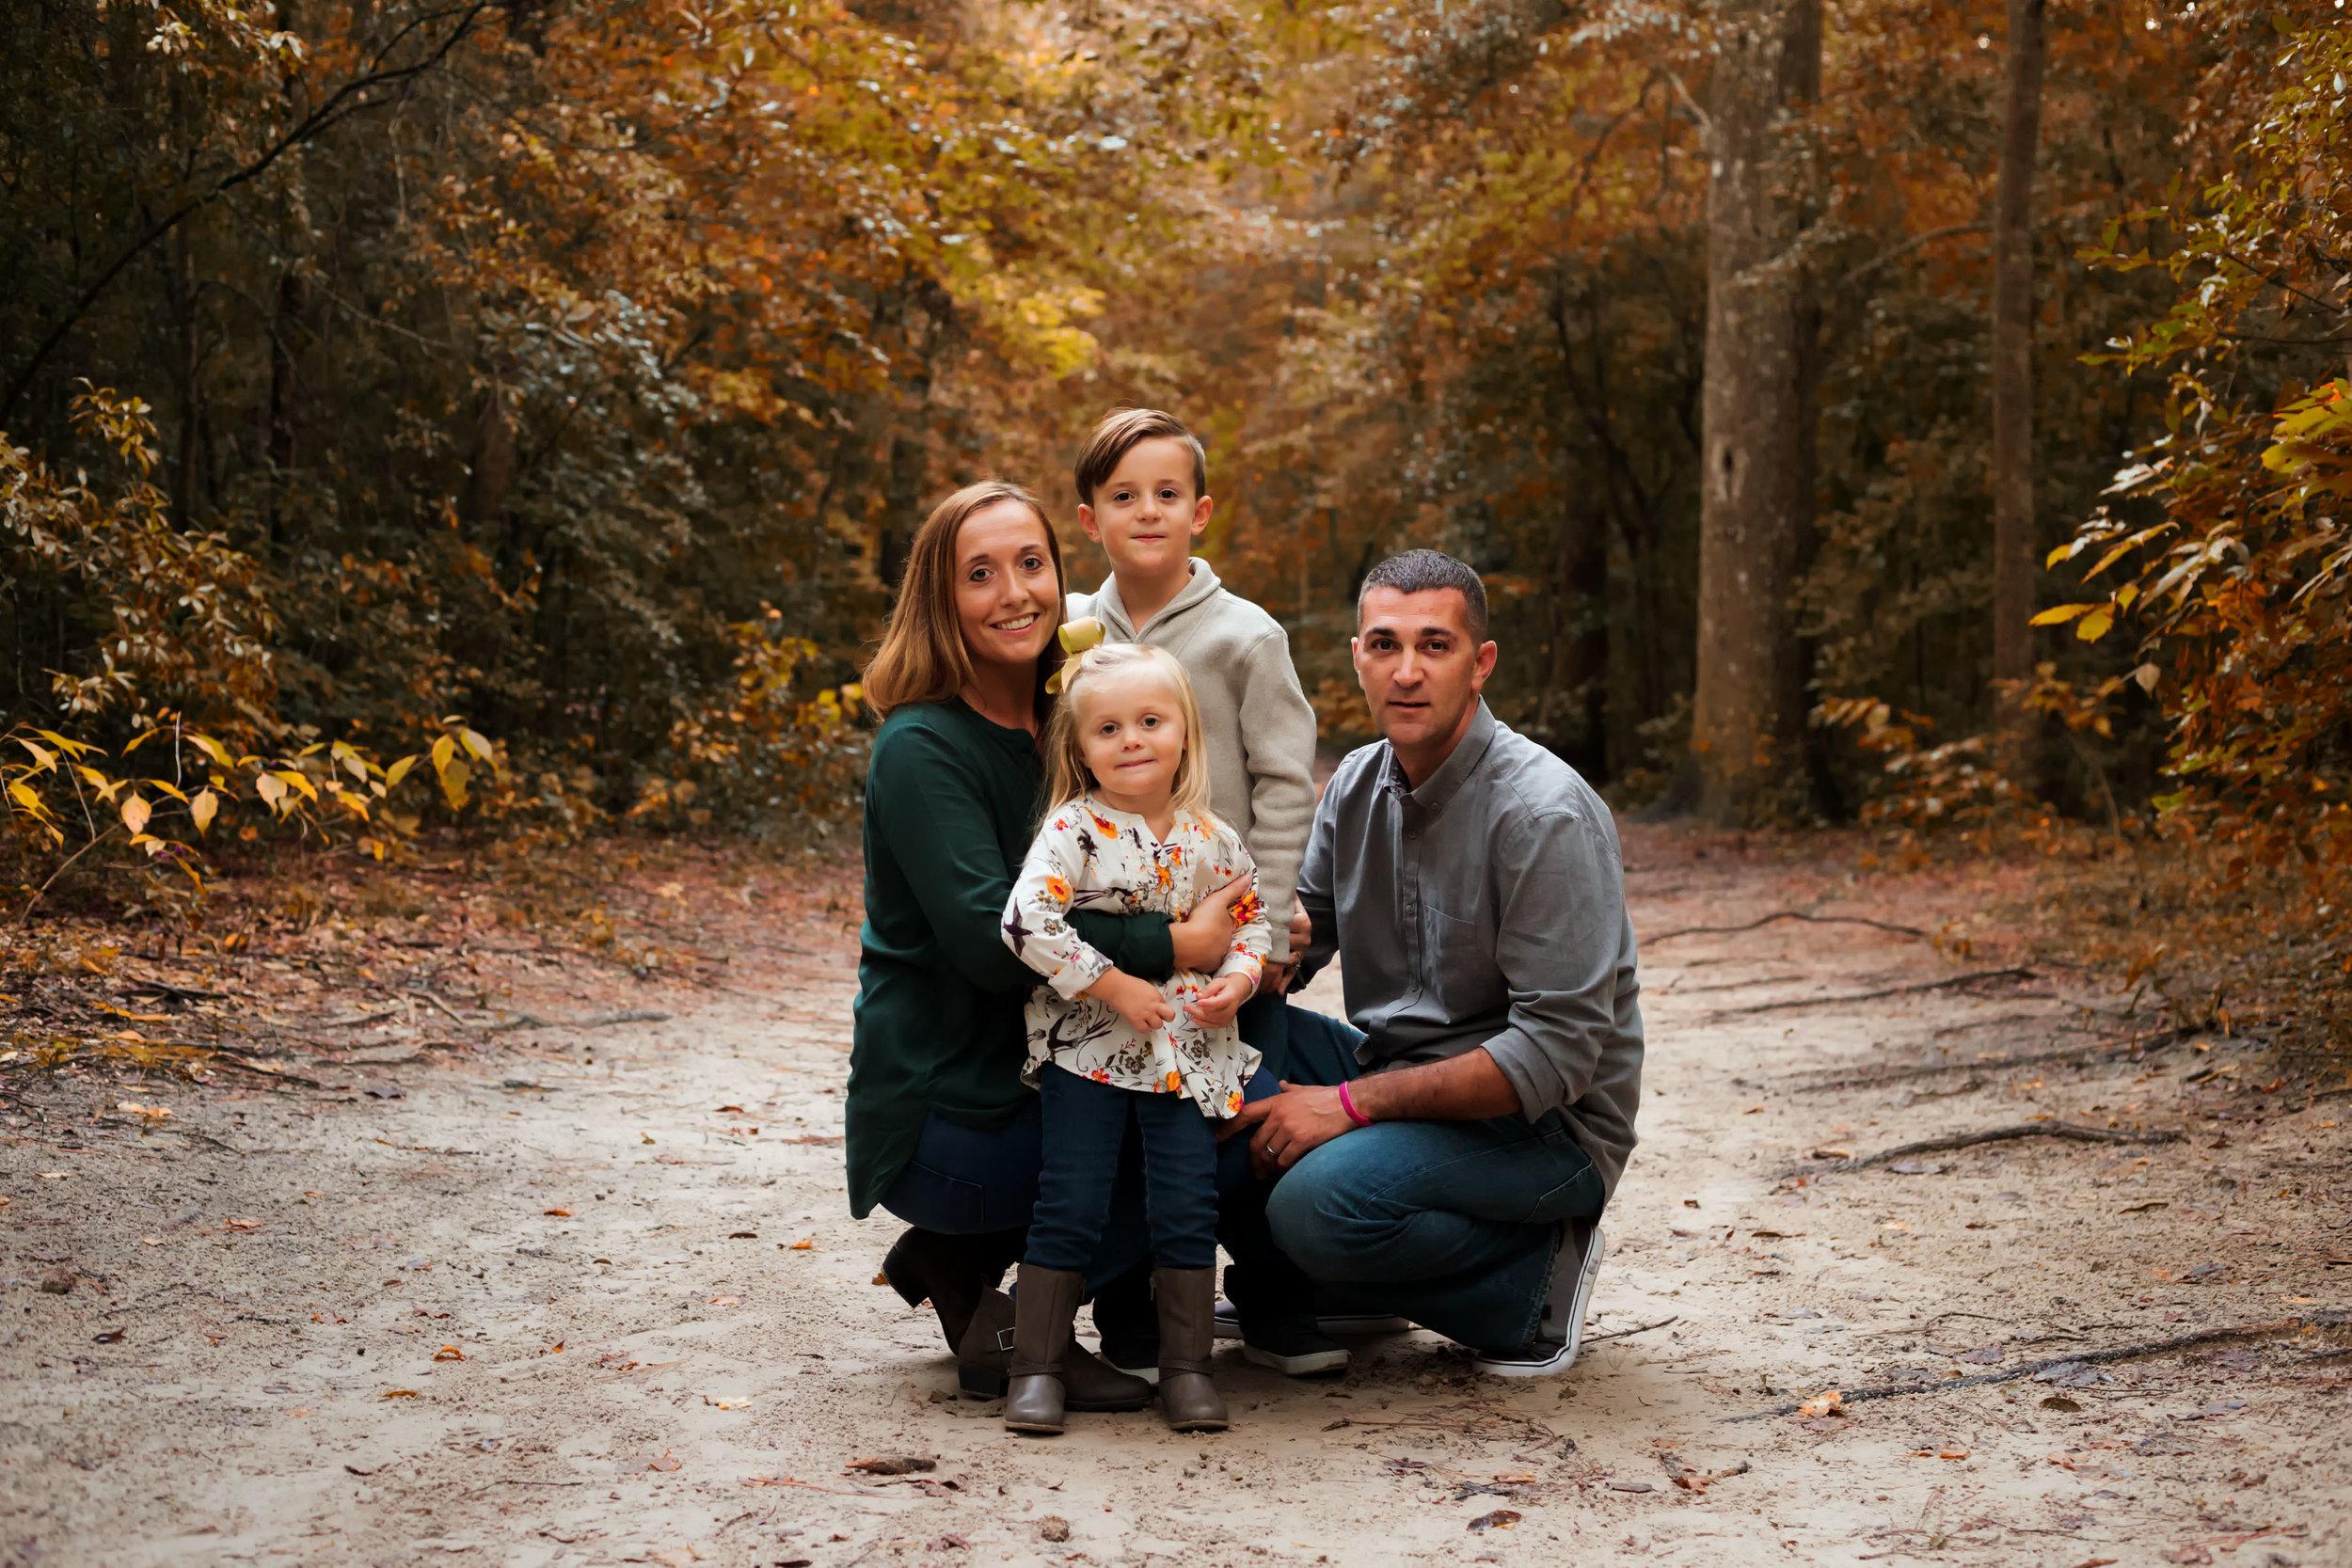 Fall-Woods-Mini-Session-Wilmington-NC-Tiffany-Abruzzo-Photography-9.jpg